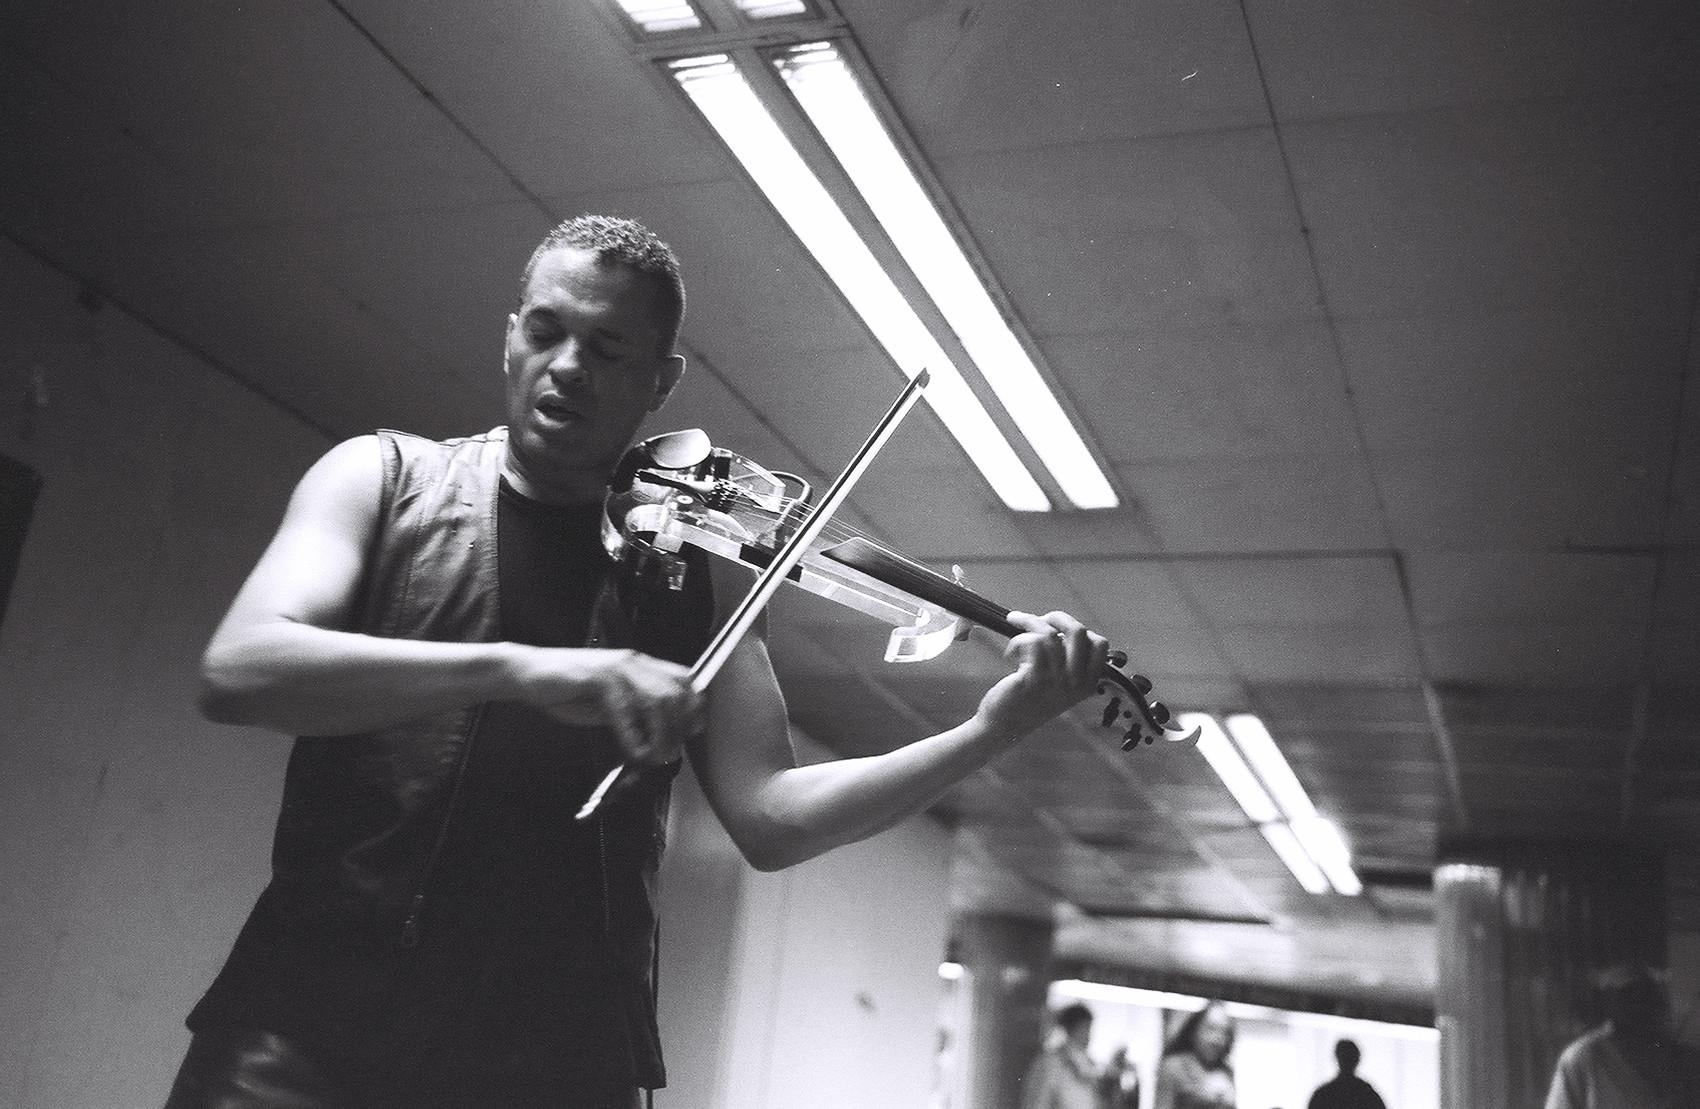 A violin player